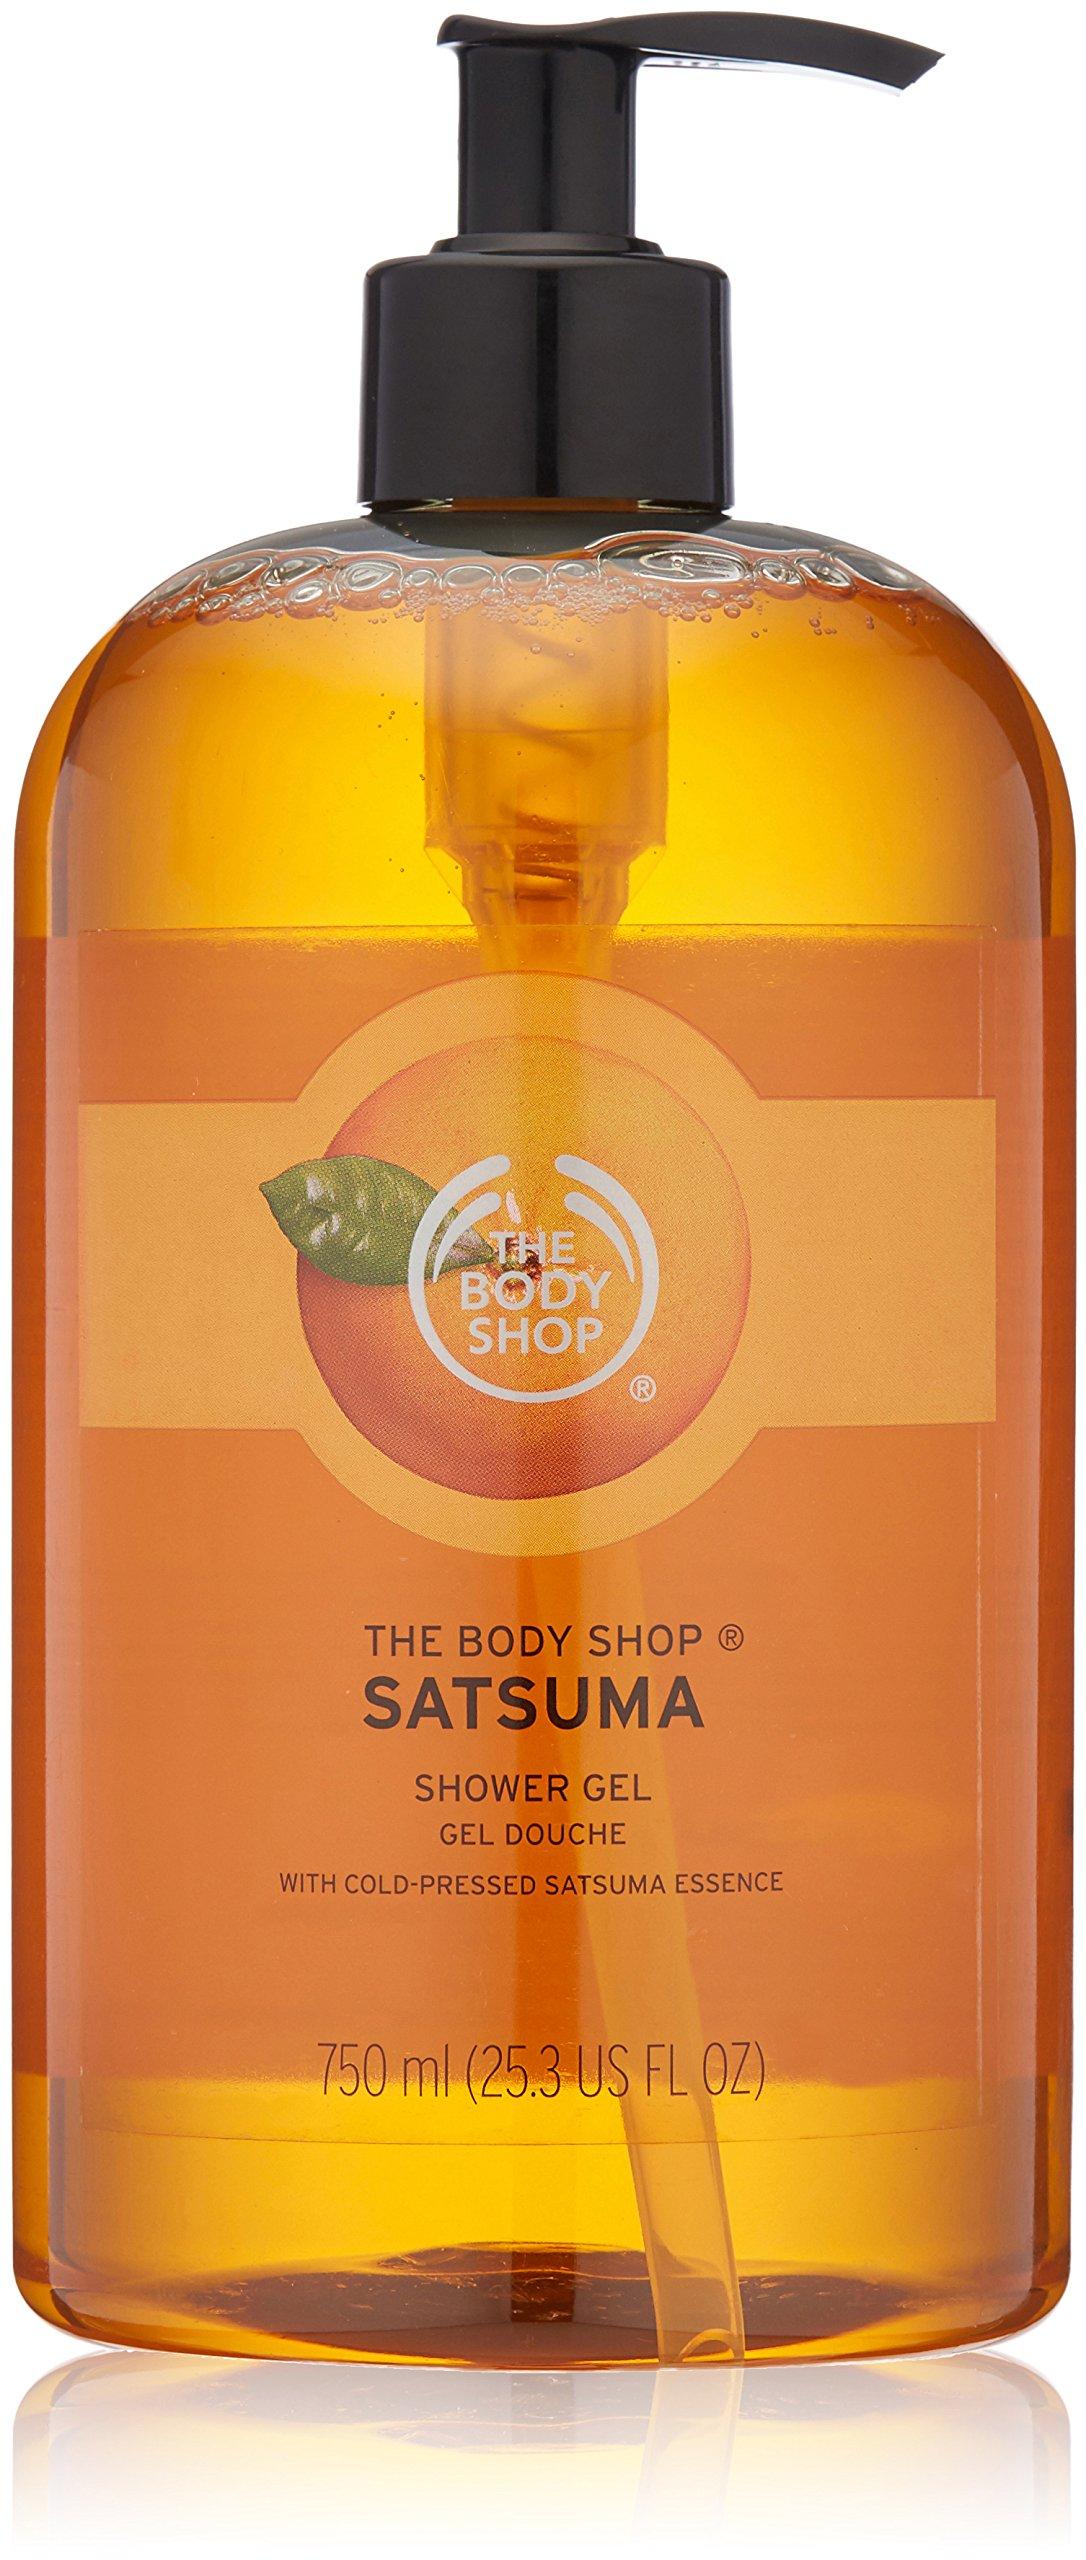 The Body Shop Satsuma Shower Gel, Paraben-Free Body Wash, Mega-Size, 25.3 Fl. Oz.